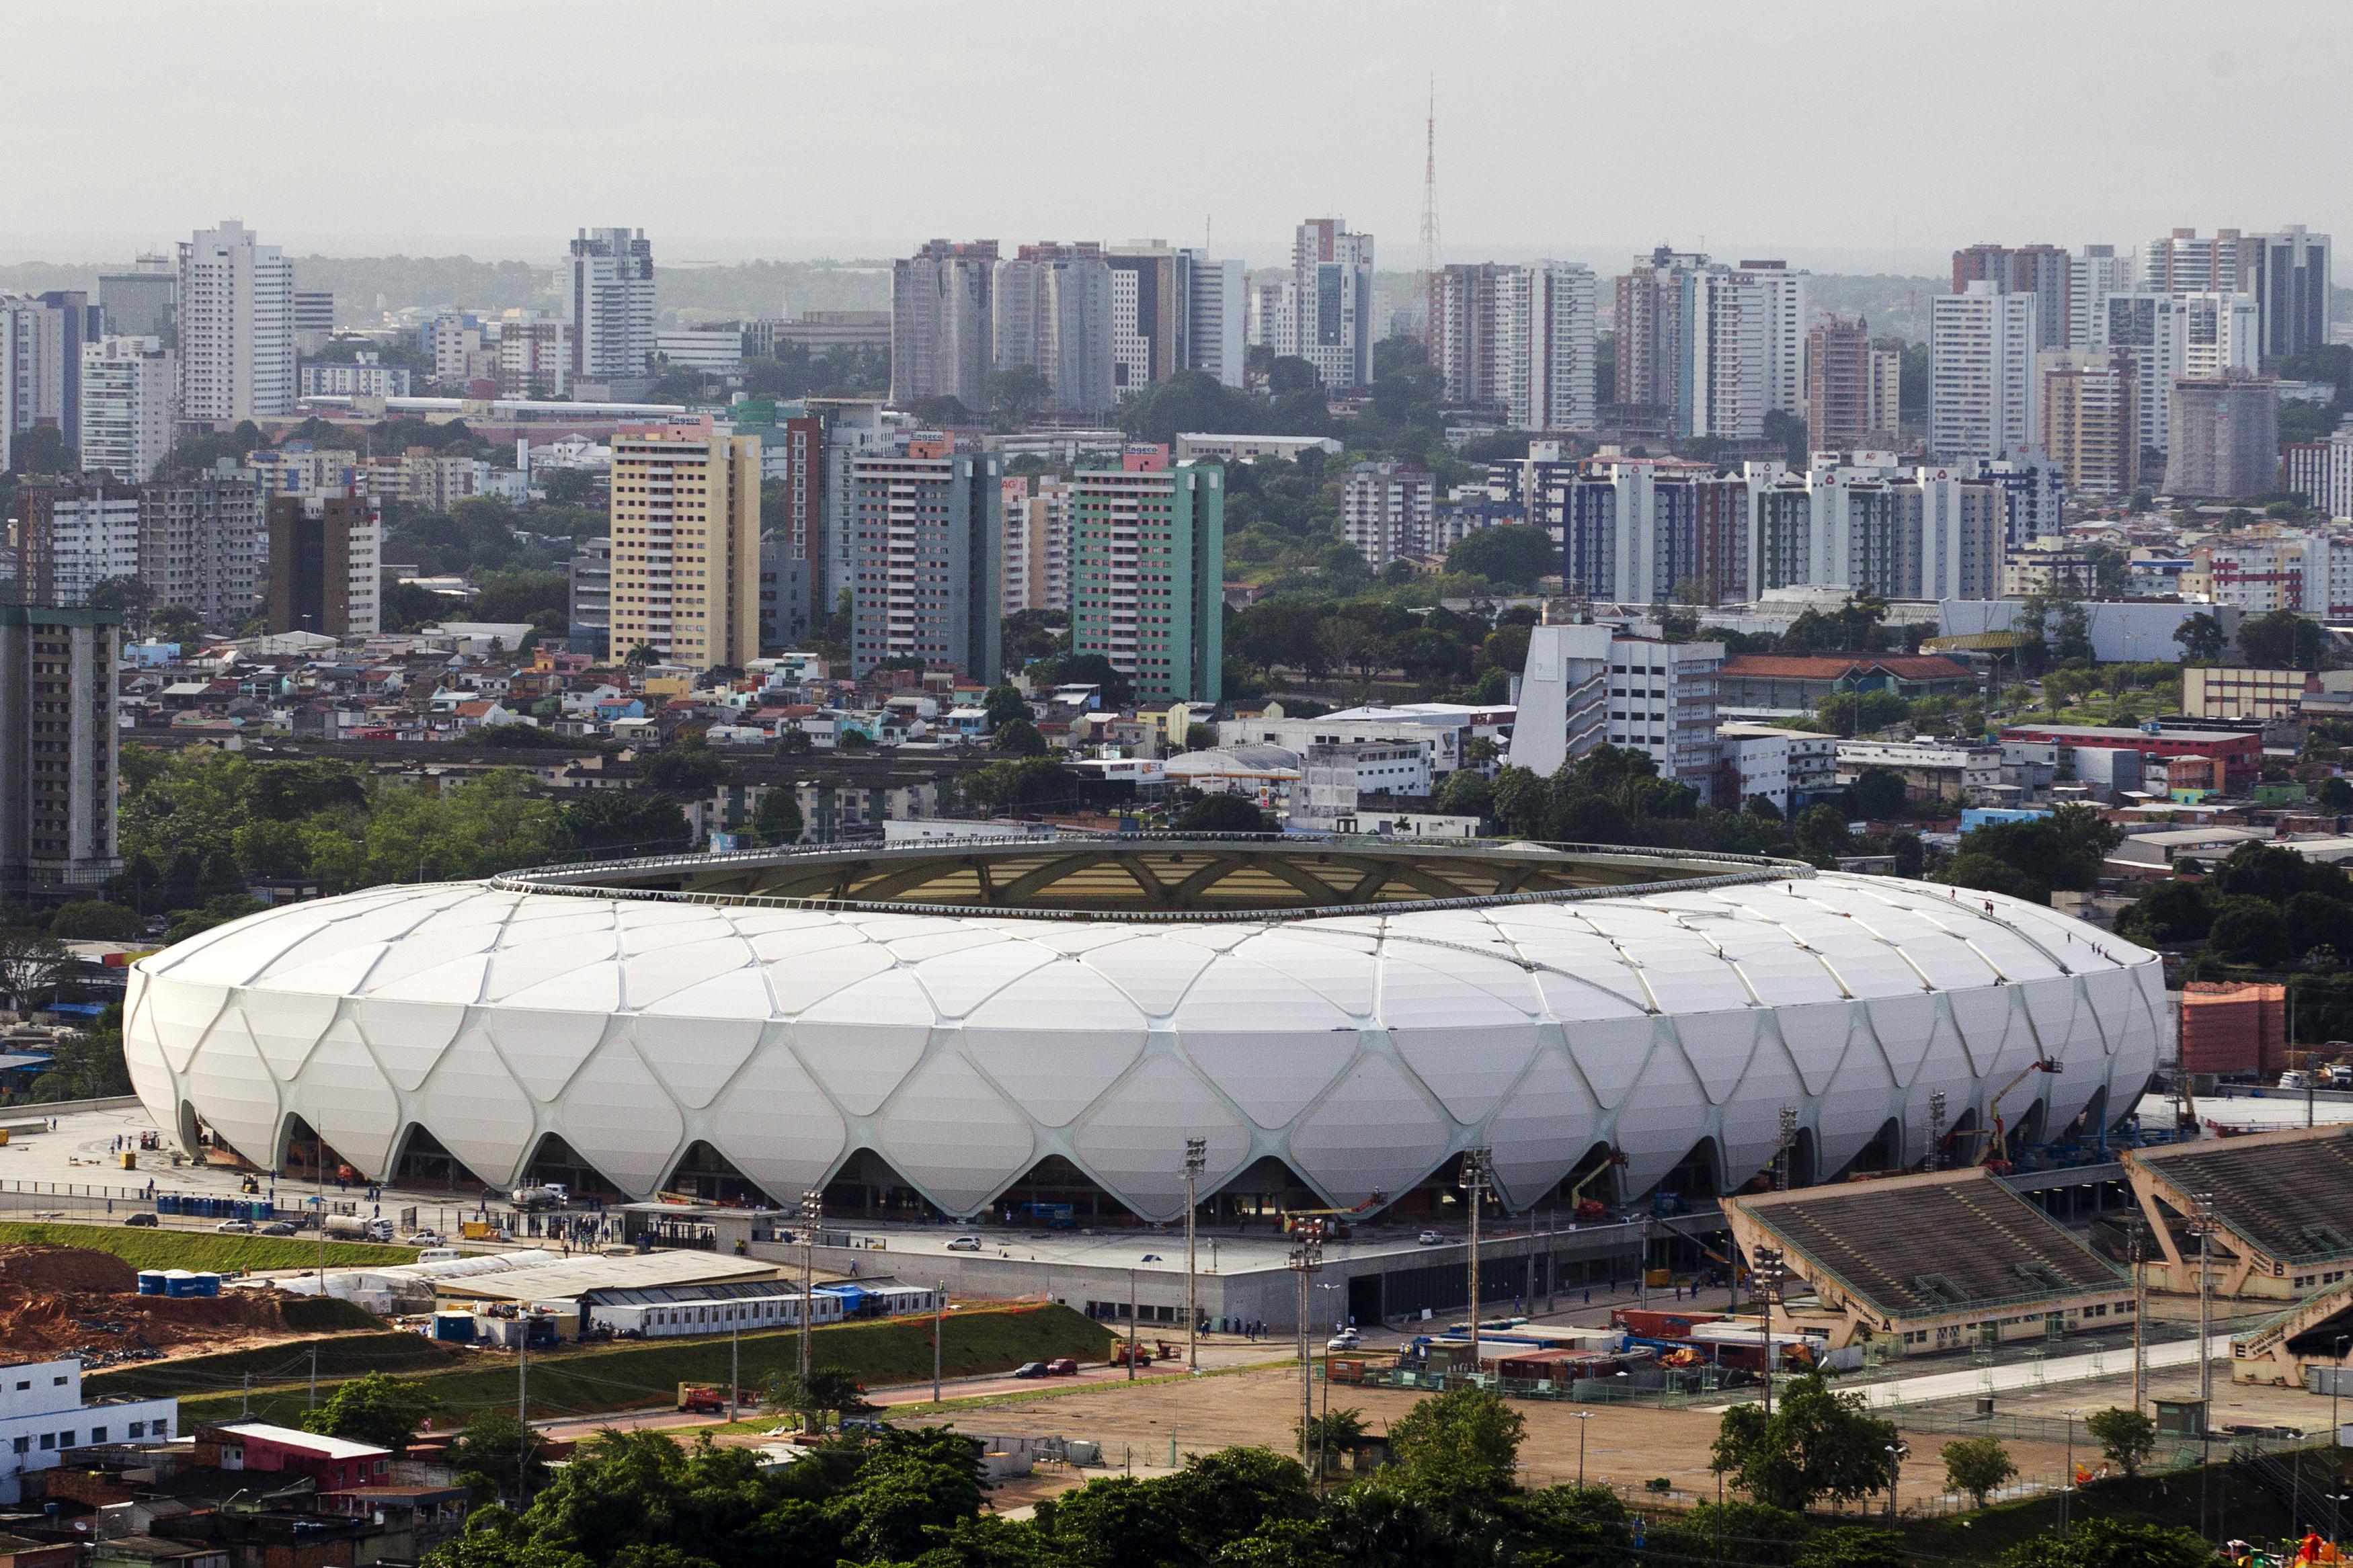 Arena Amazonia                                                              City: Manaus                                                              Constructed: 2013                                                              Capacity: 39,100